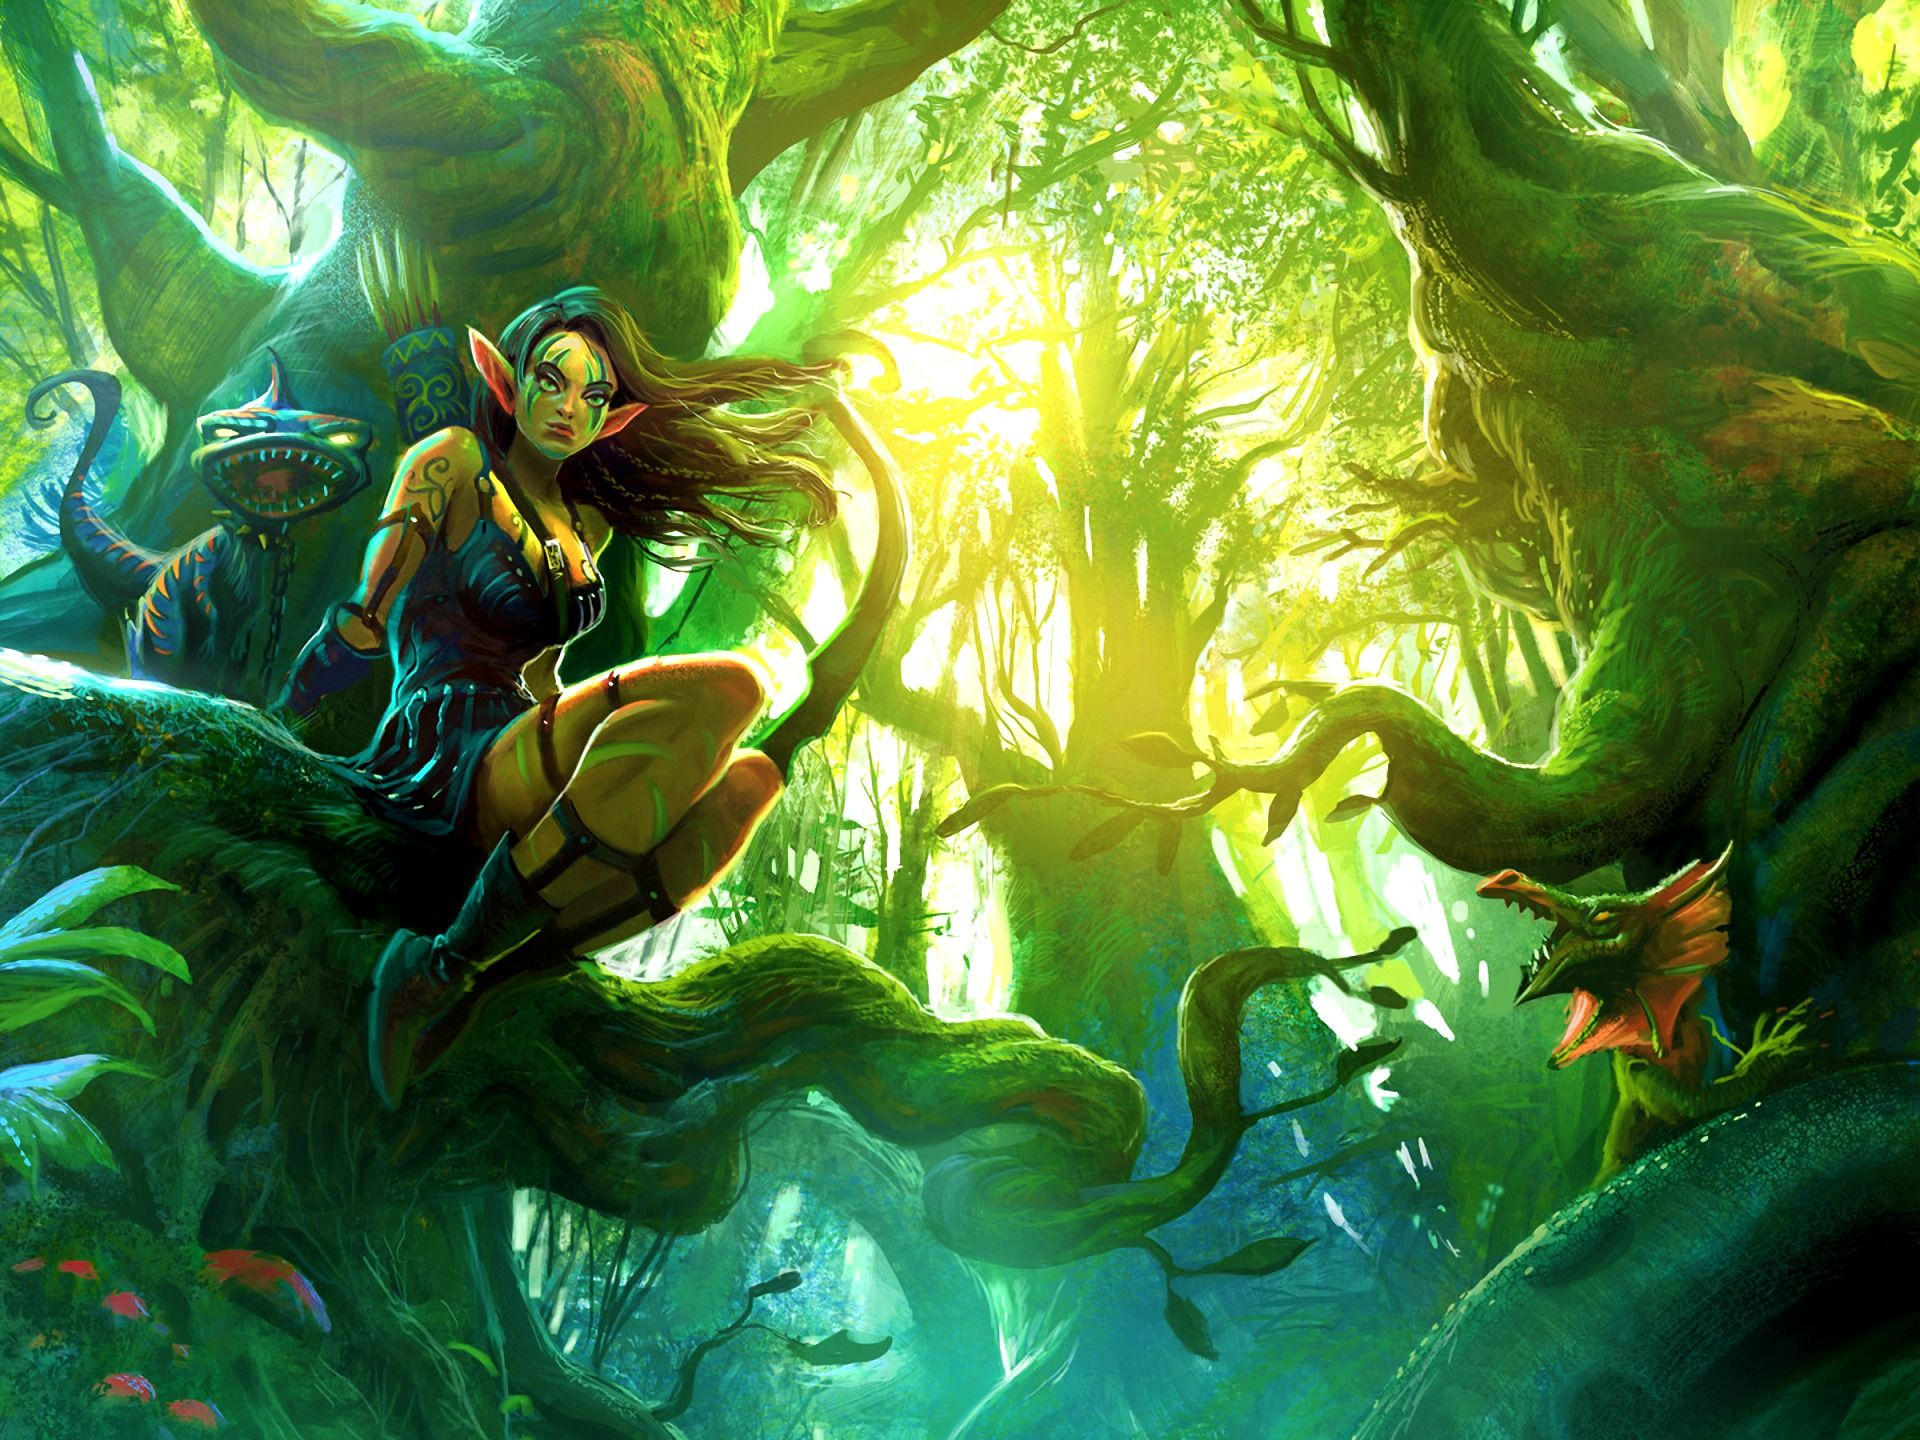 Fantasy Wallpaper Elf Elves Fantasy Elf Art Forest Elf